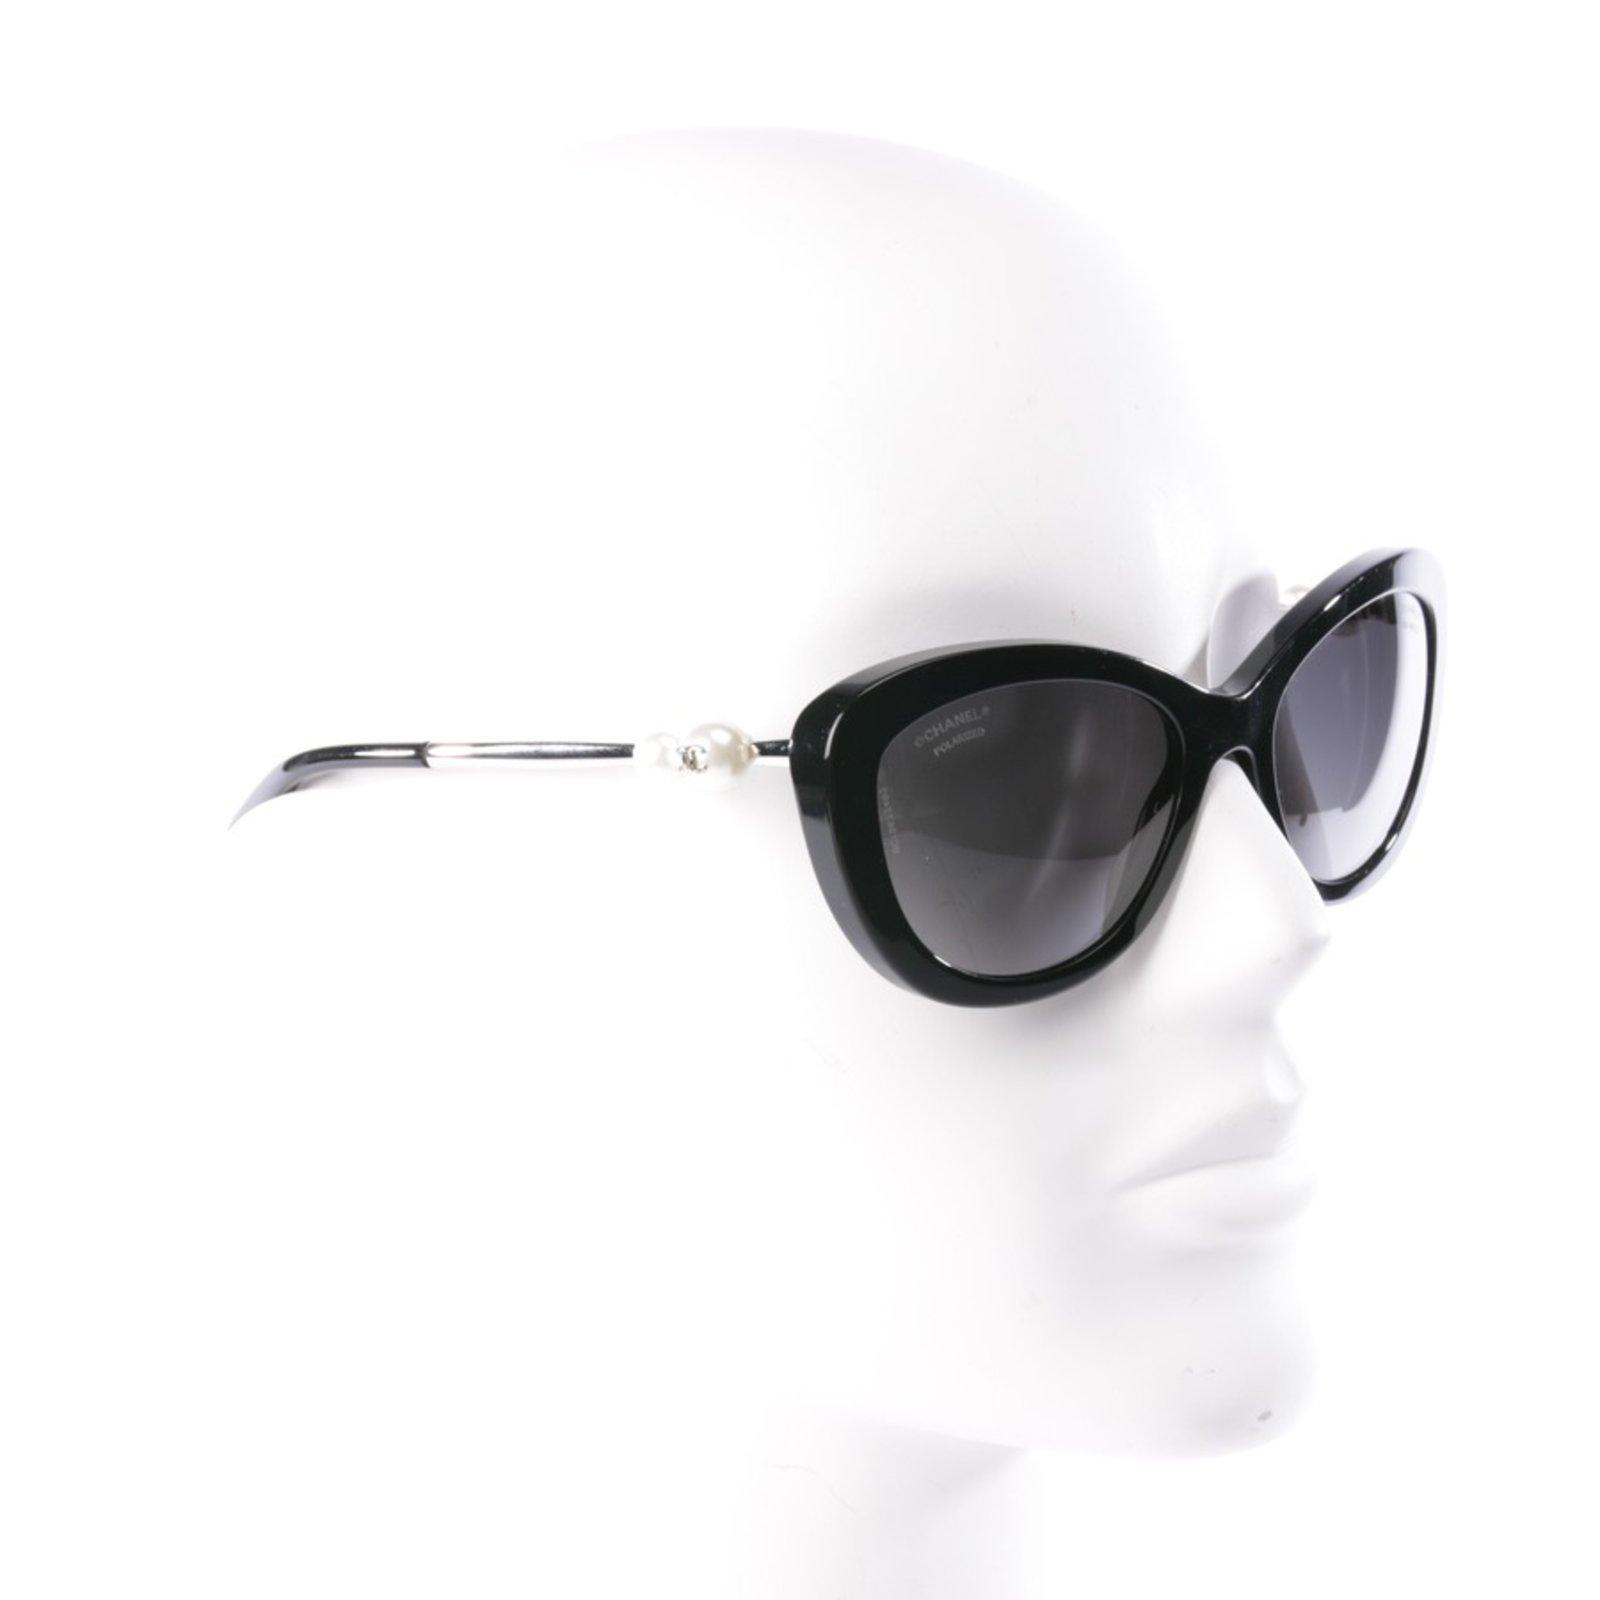 aa041aa36c Chanel Sunglasses 5340-H Sunglasses Plastic Black ref.76601 - Joli Closet